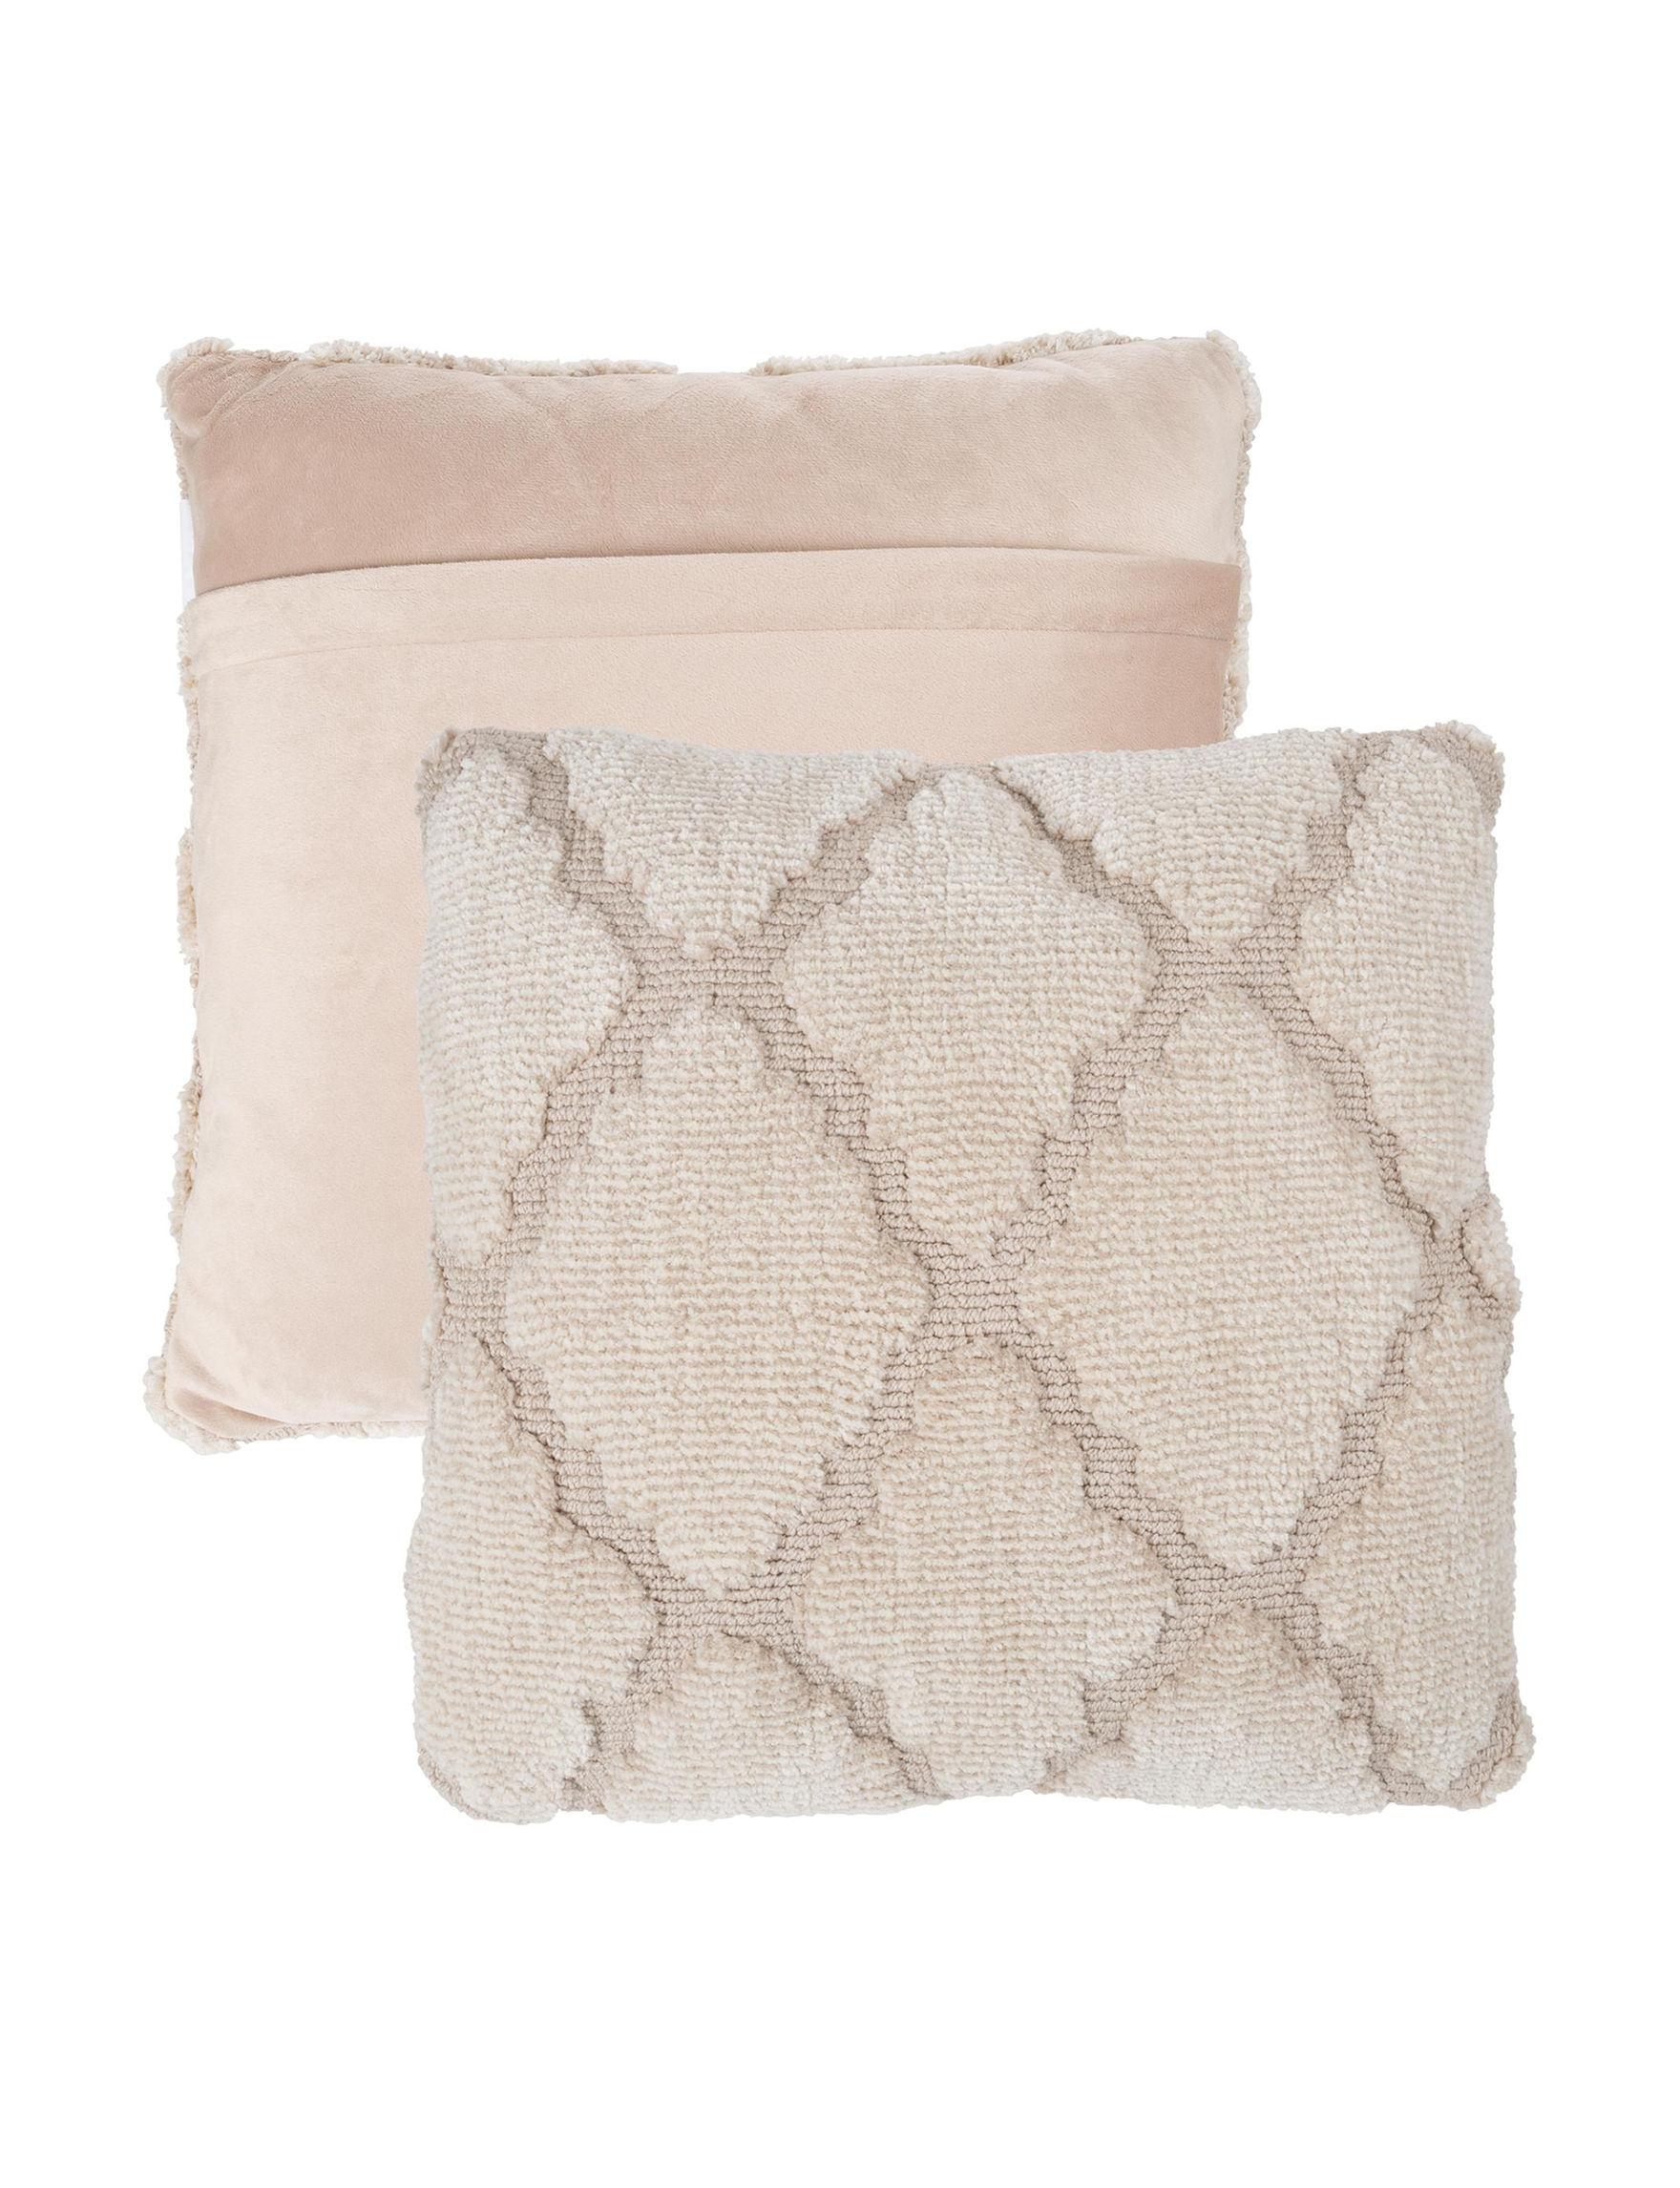 Lavish Home Beige Decorative Pillows